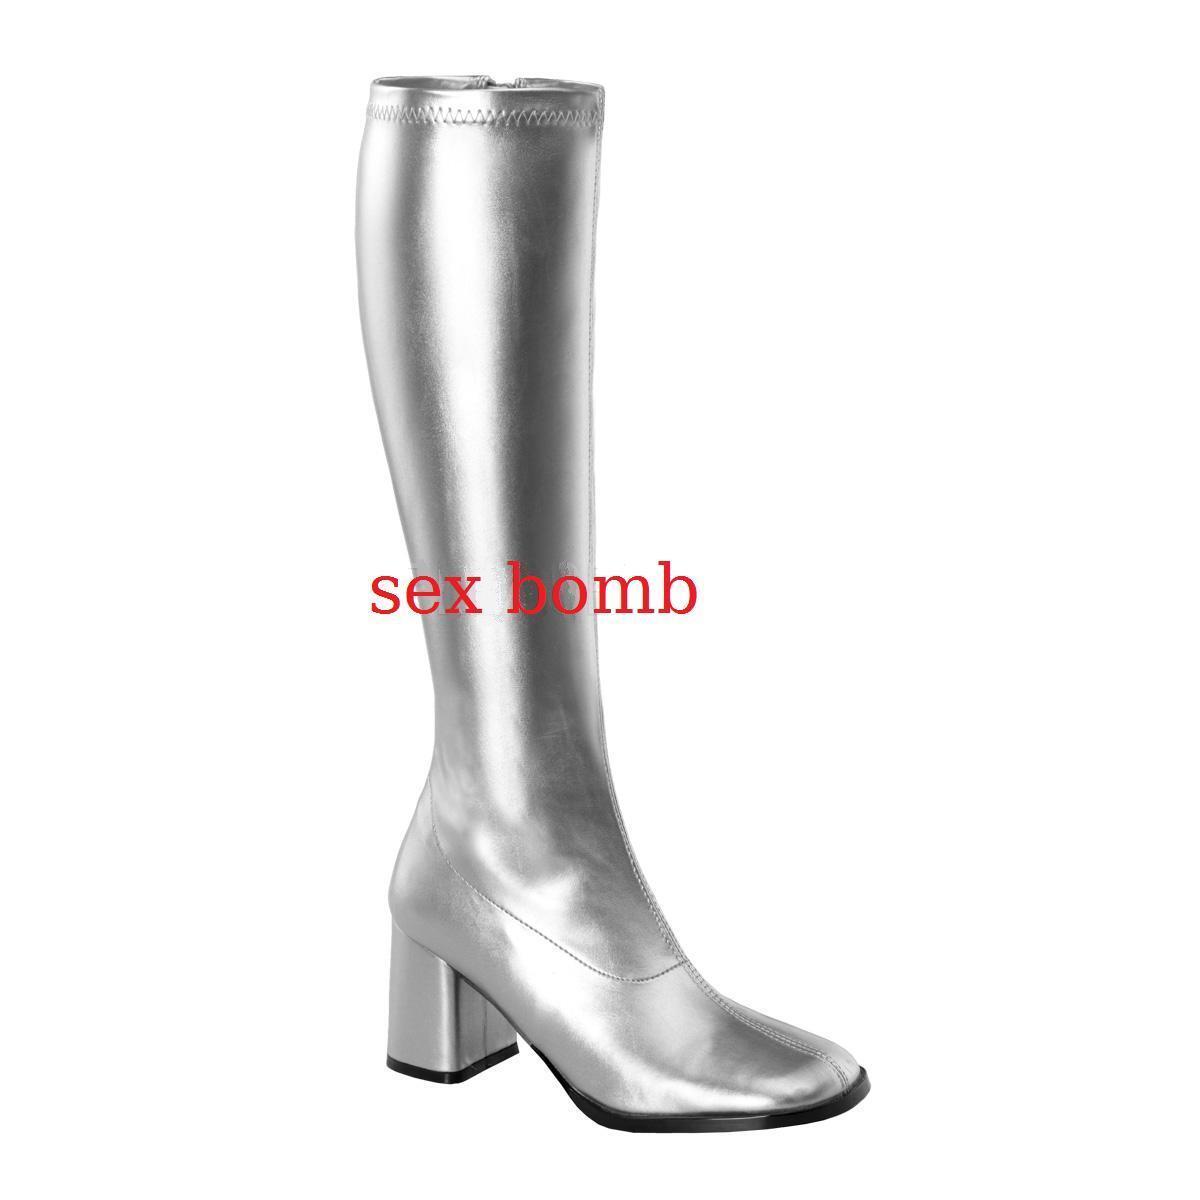 Sexy botas botas botas tacco 7,5 plata dal 35 al 46 zip laterale zapatos cosplay GLAMOUR  lo último